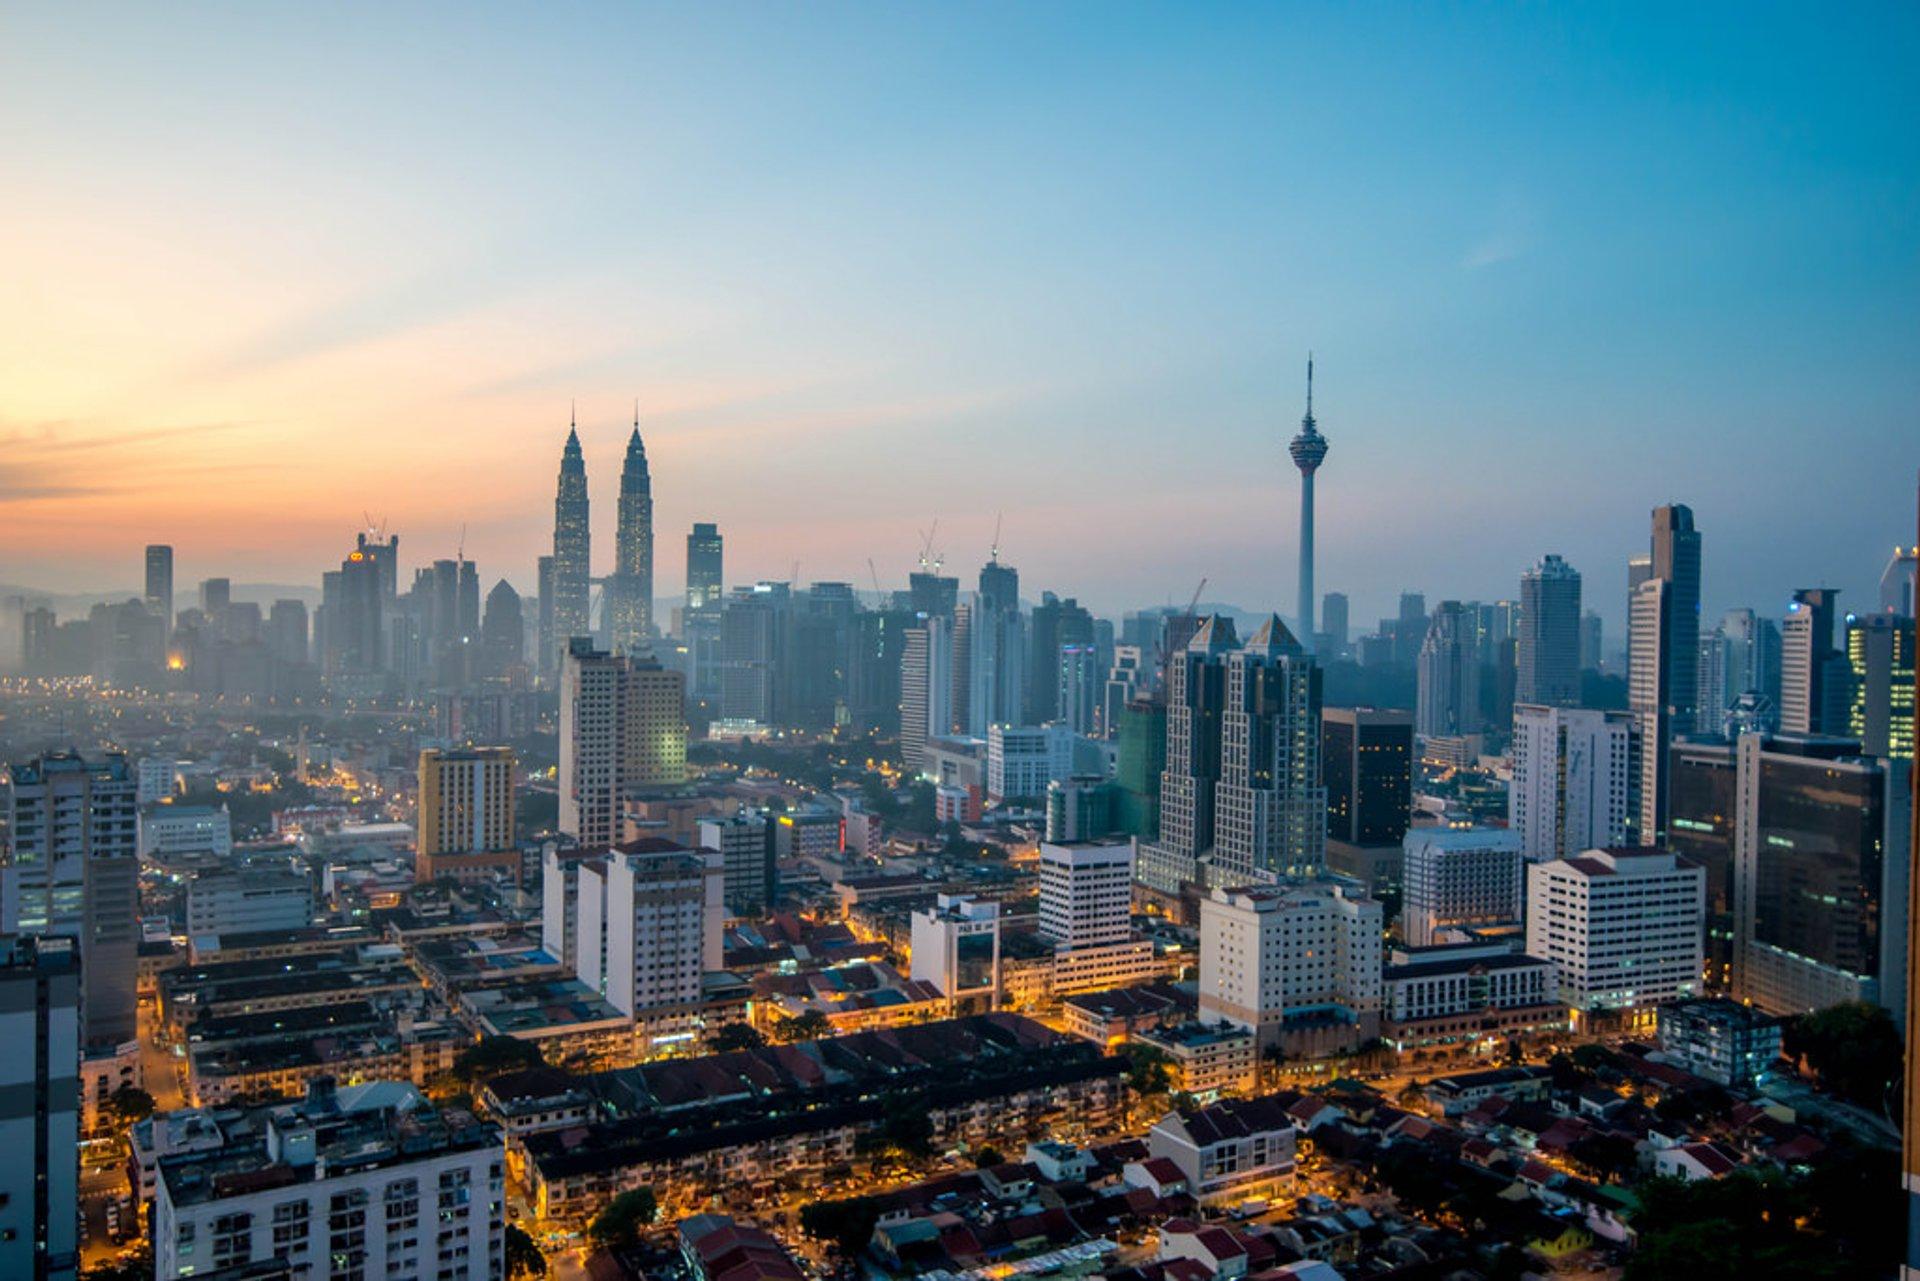 Kuala Lumpur at dawn 2019